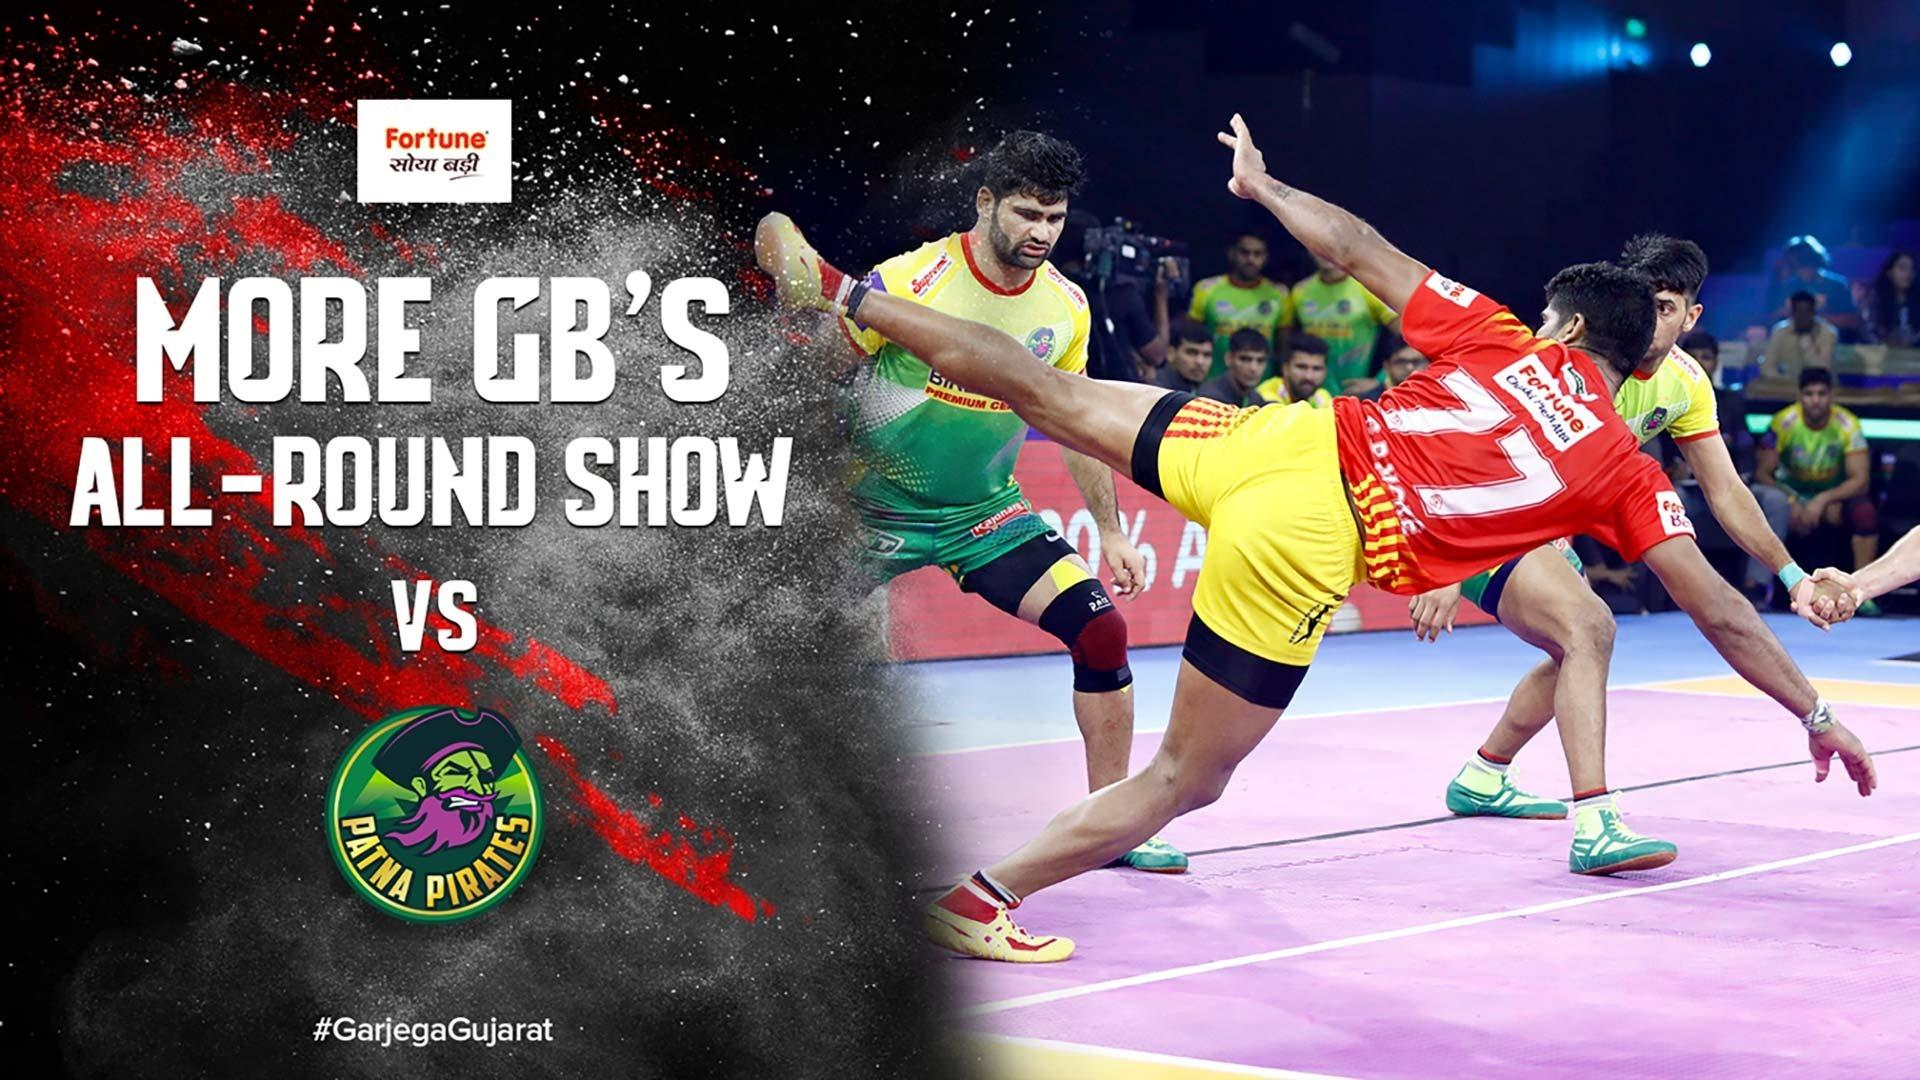 More GB's Stunning All-Round Show Against Patna Pirates | Vivo Pro Kabaddi Season 7